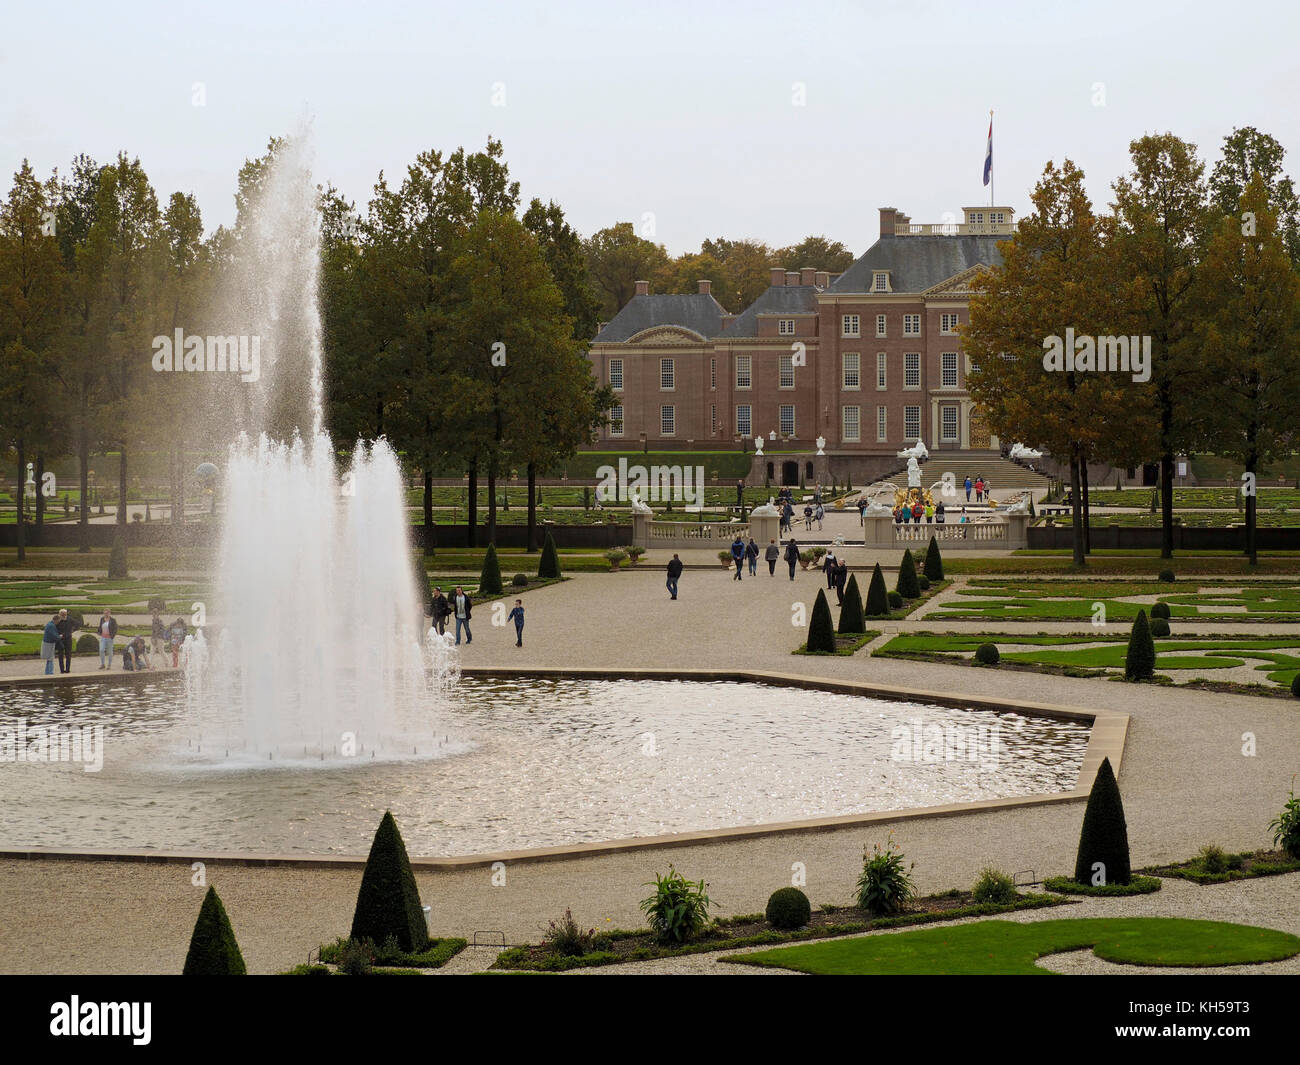 Historic Garden Dutch Heritage Stock Photos & Historic Garden Dutch ...